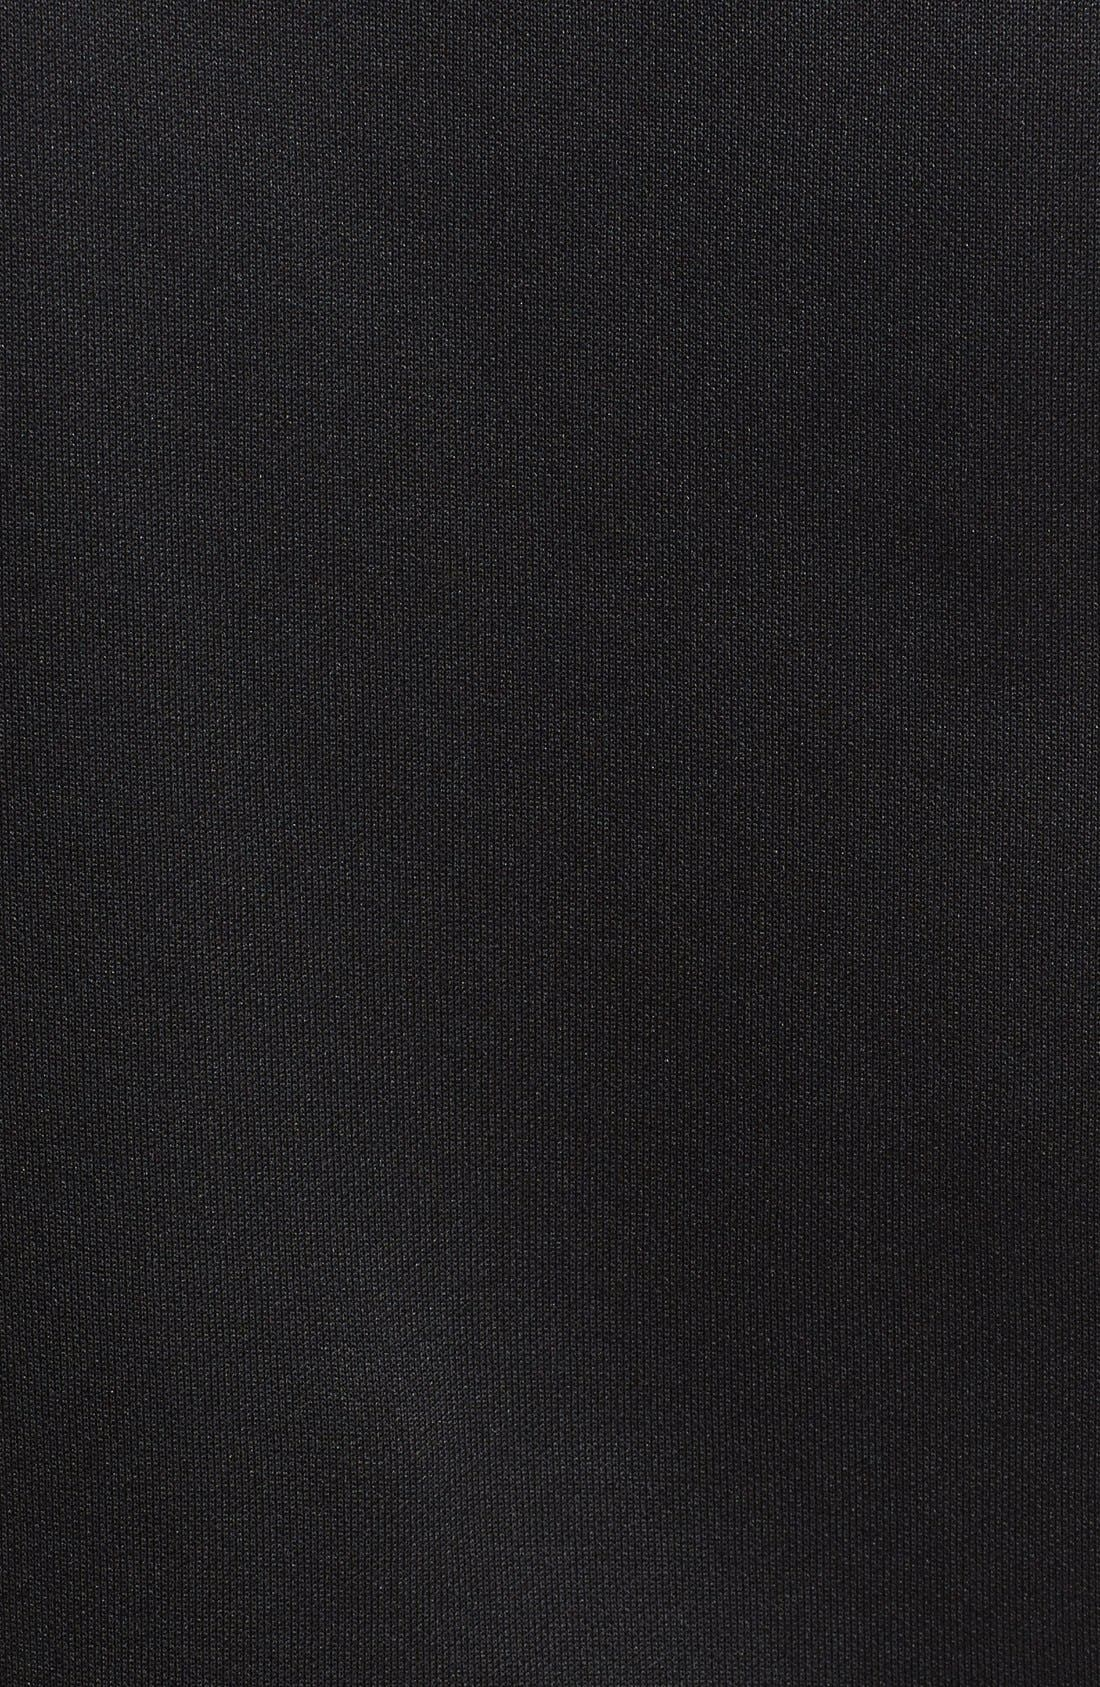 Alternate Image 3  - Moschino Chain & Faux Pearl Embellished Sweatshirt